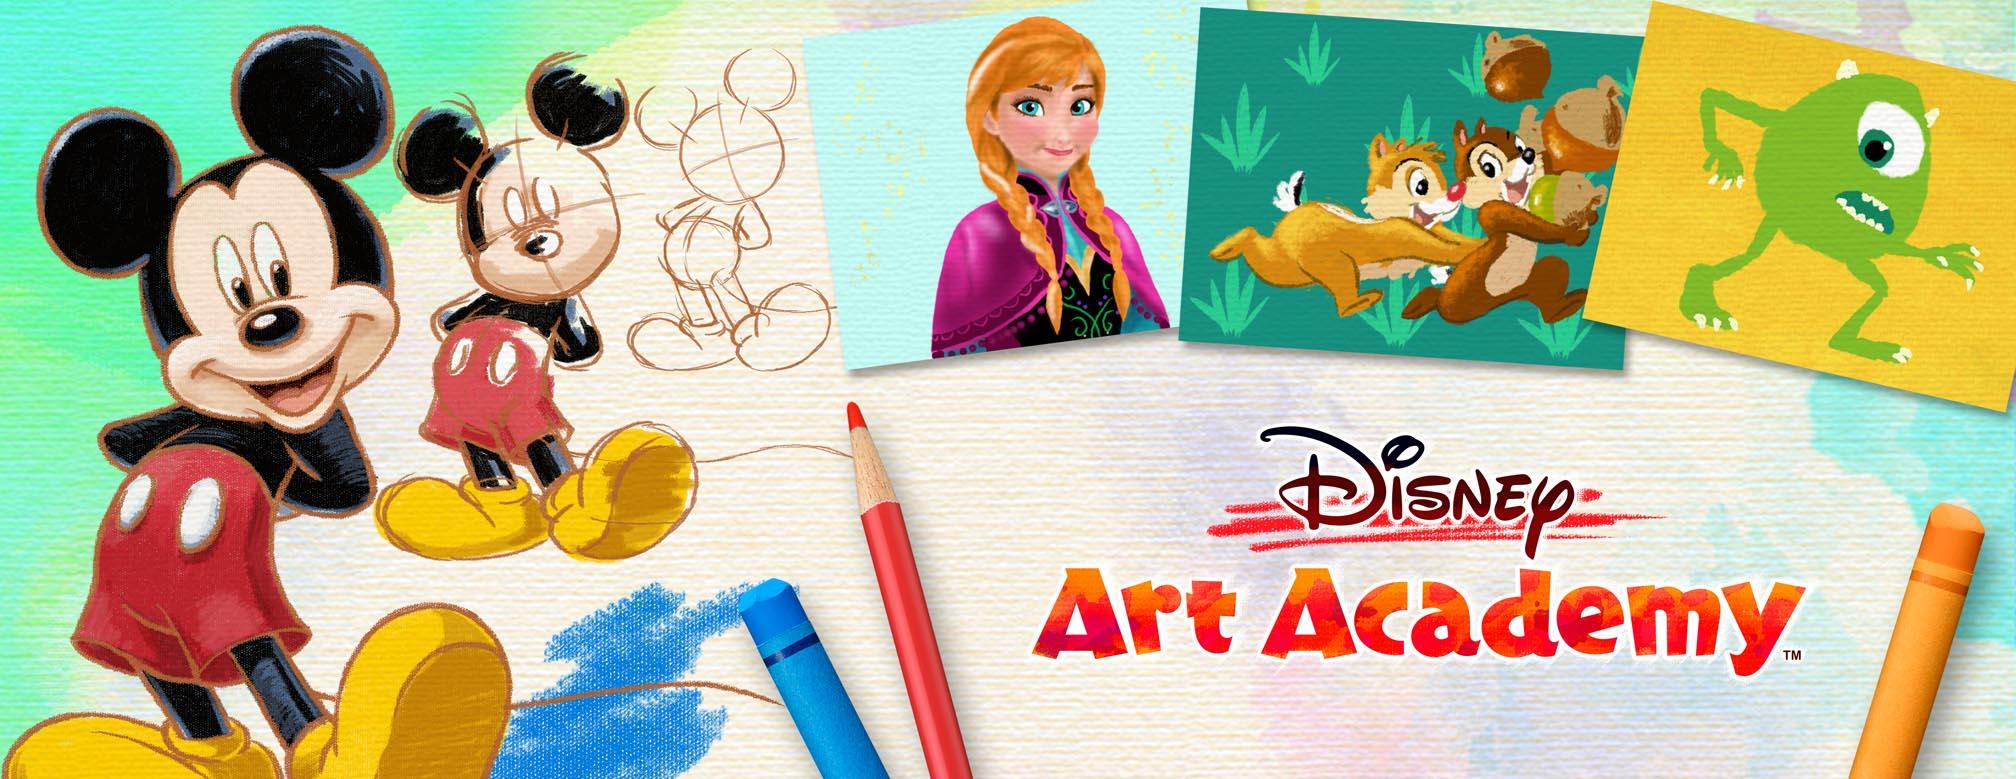 Disney Art Academy illustration